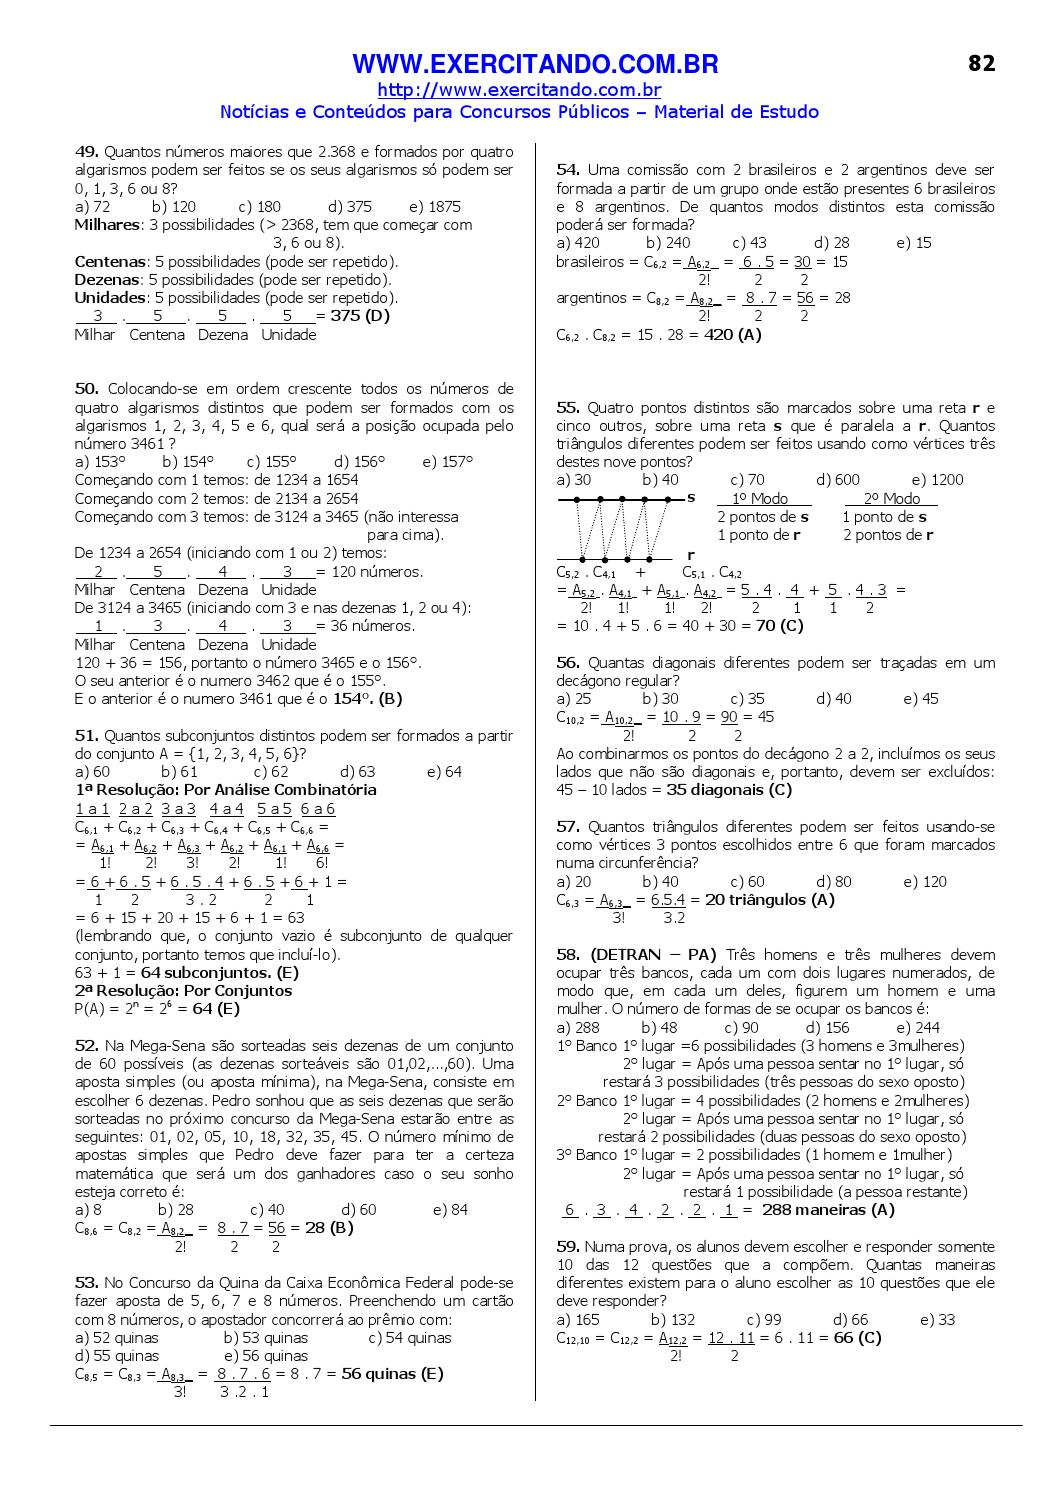 Matematica 1400 Questoes Resolvidas E Gabaritadas By Cleidvaldo Oliveira